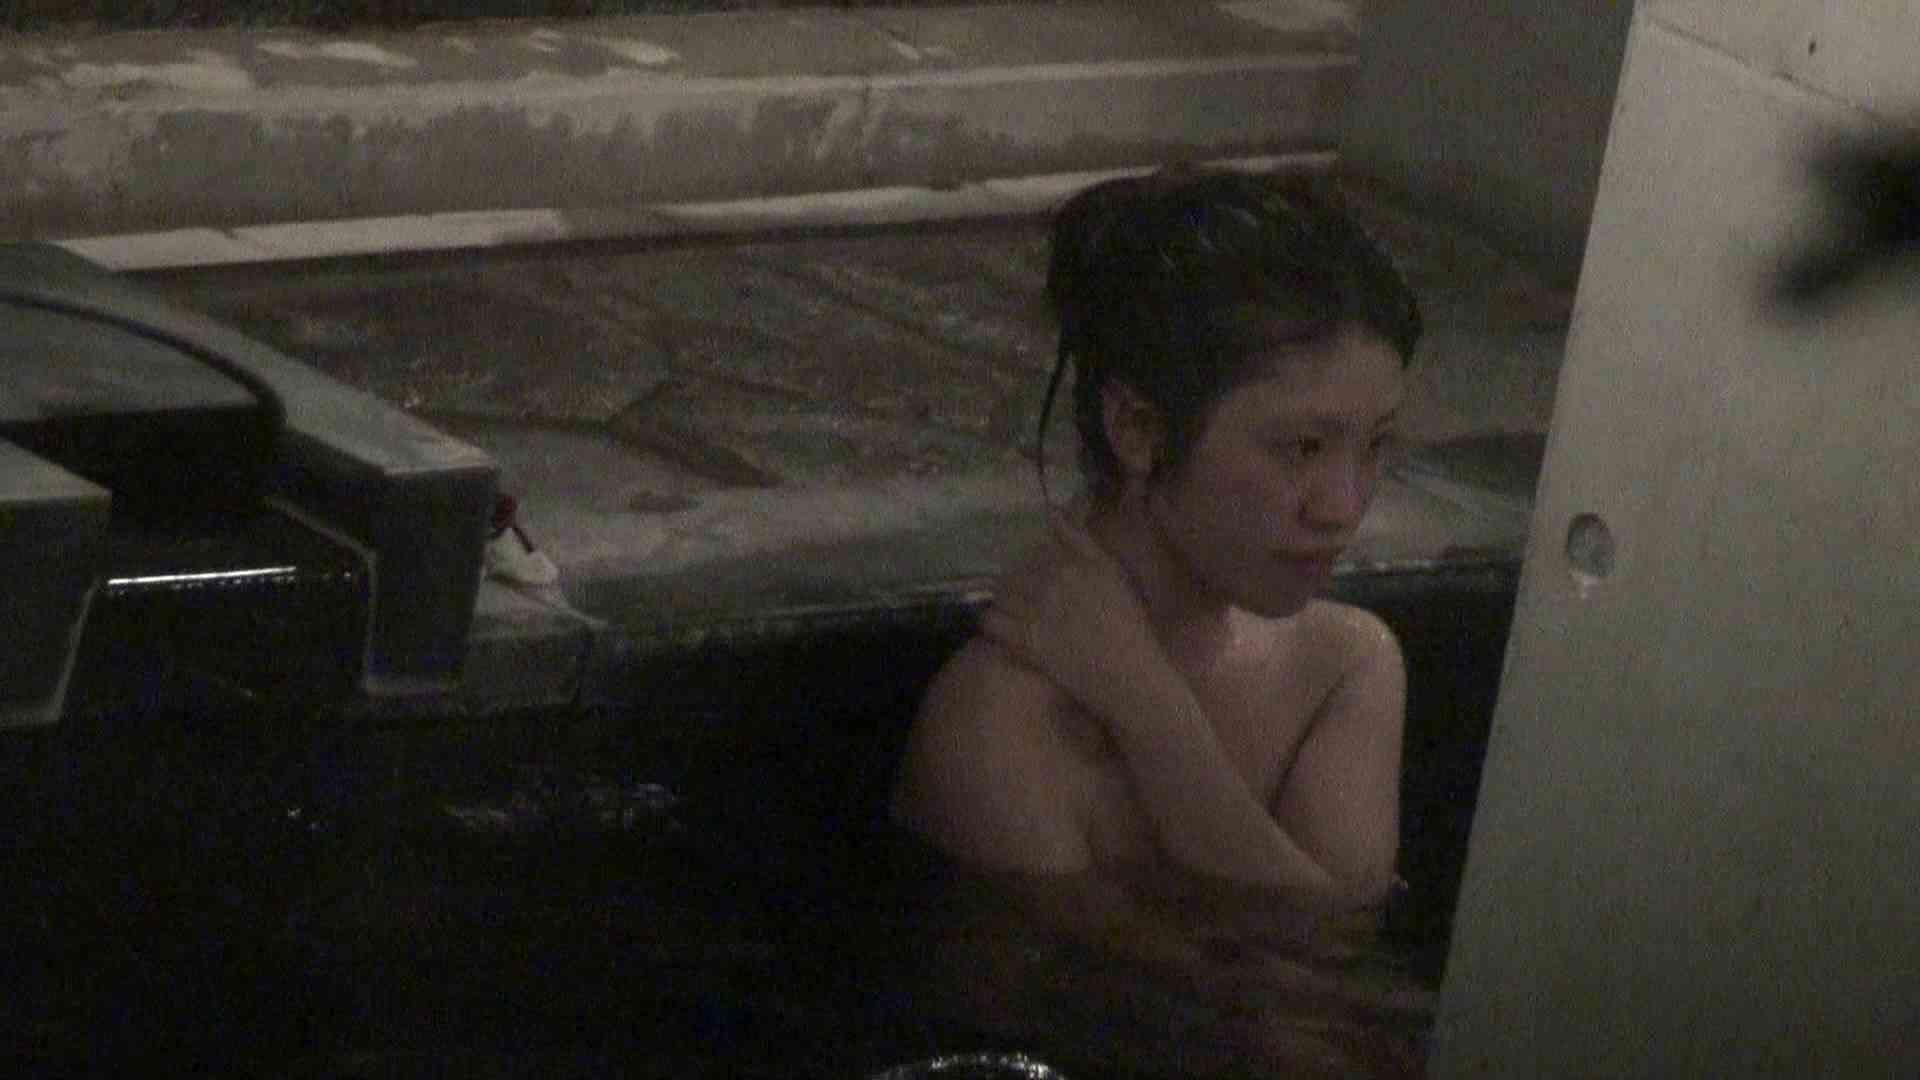 Aquaな露天風呂Vol.371 盗撮大放出 性交動画流出 92連発 43